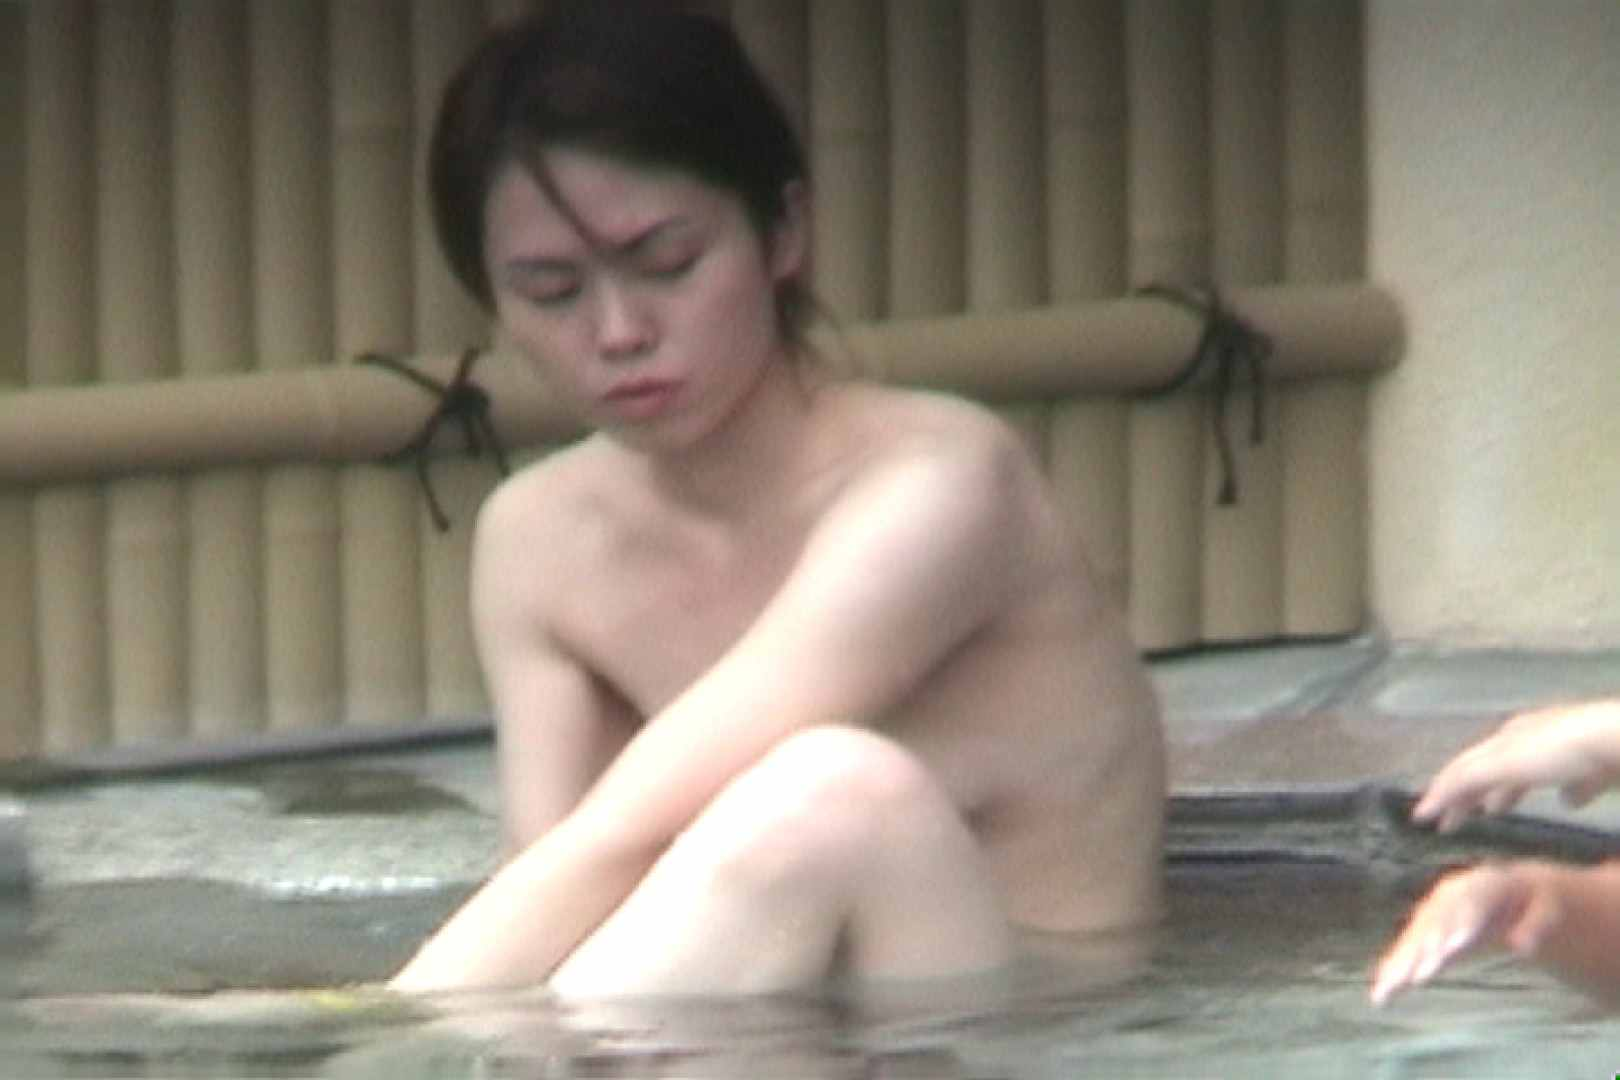 Aquaな露天風呂Vol.558 美しいOLの裸体 AV無料動画キャプチャ 86pic 35